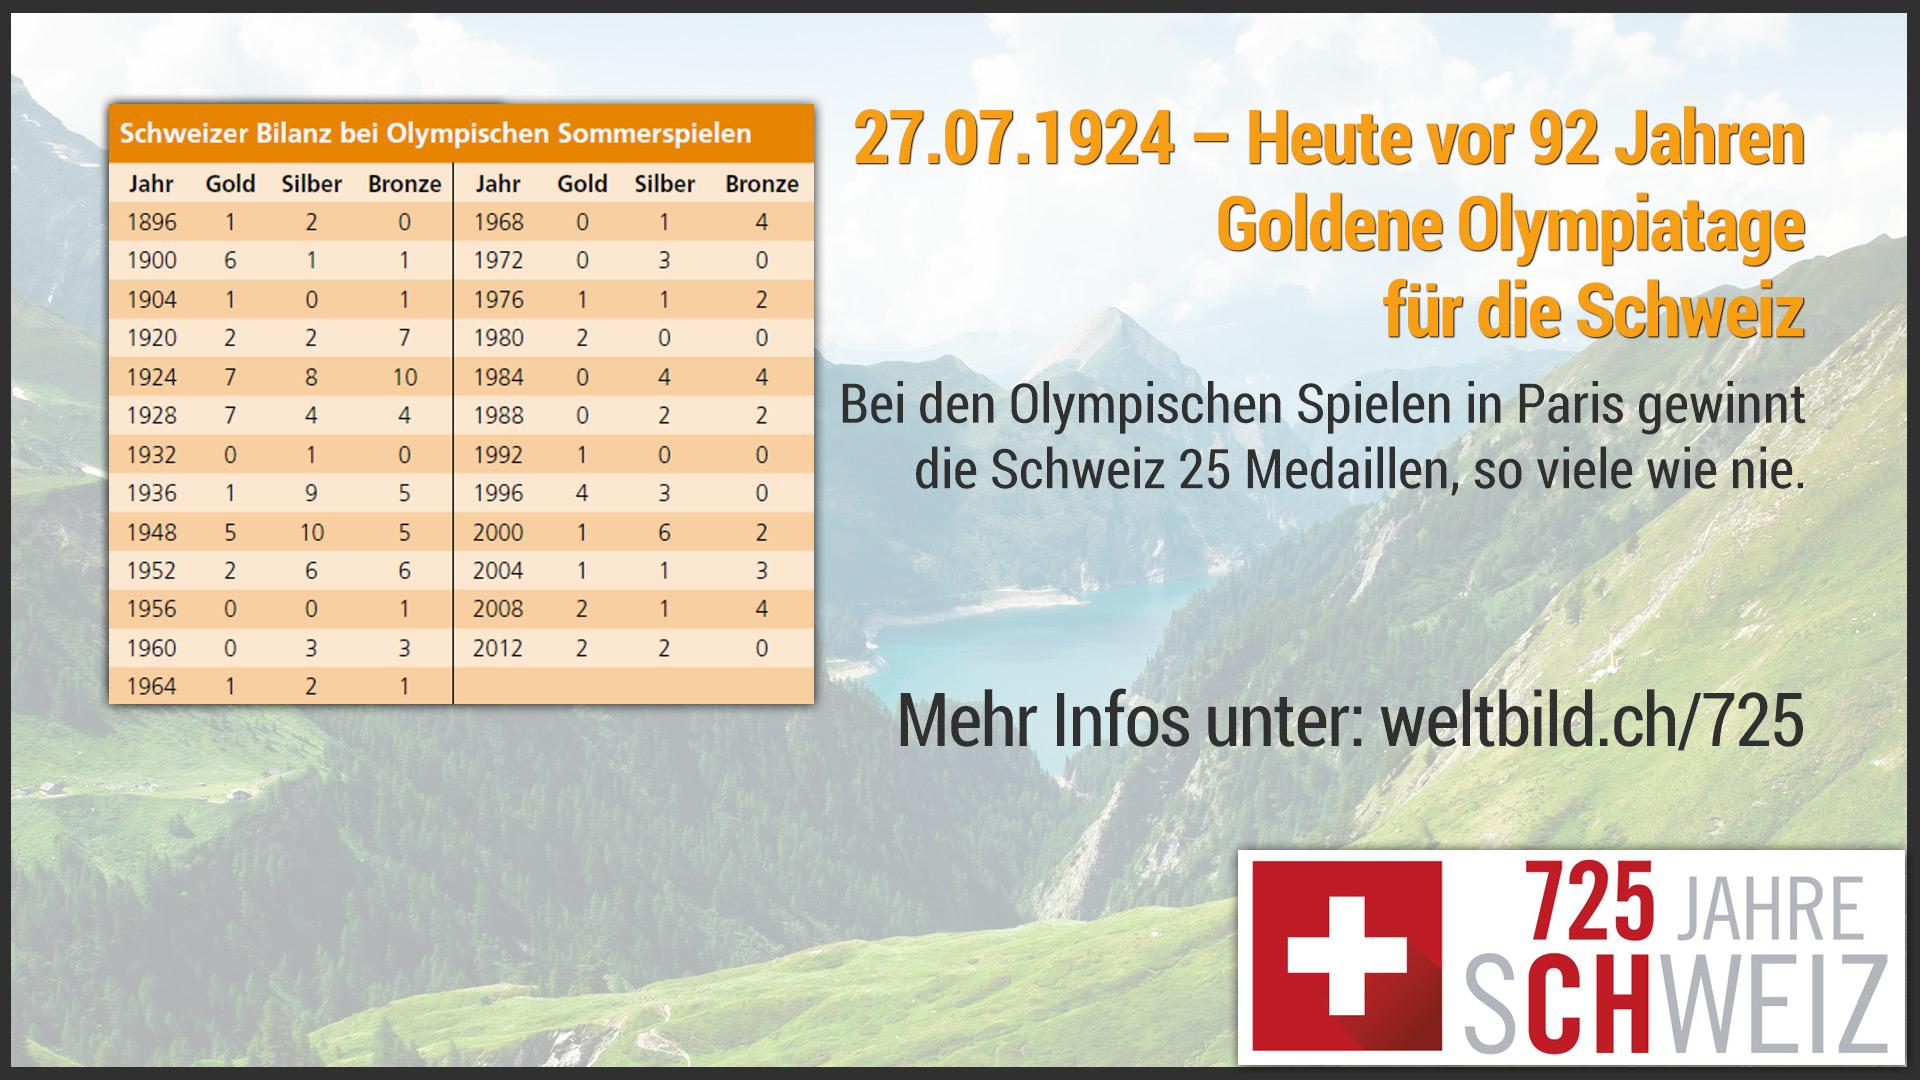 instore_160727_olympiatage01_ch